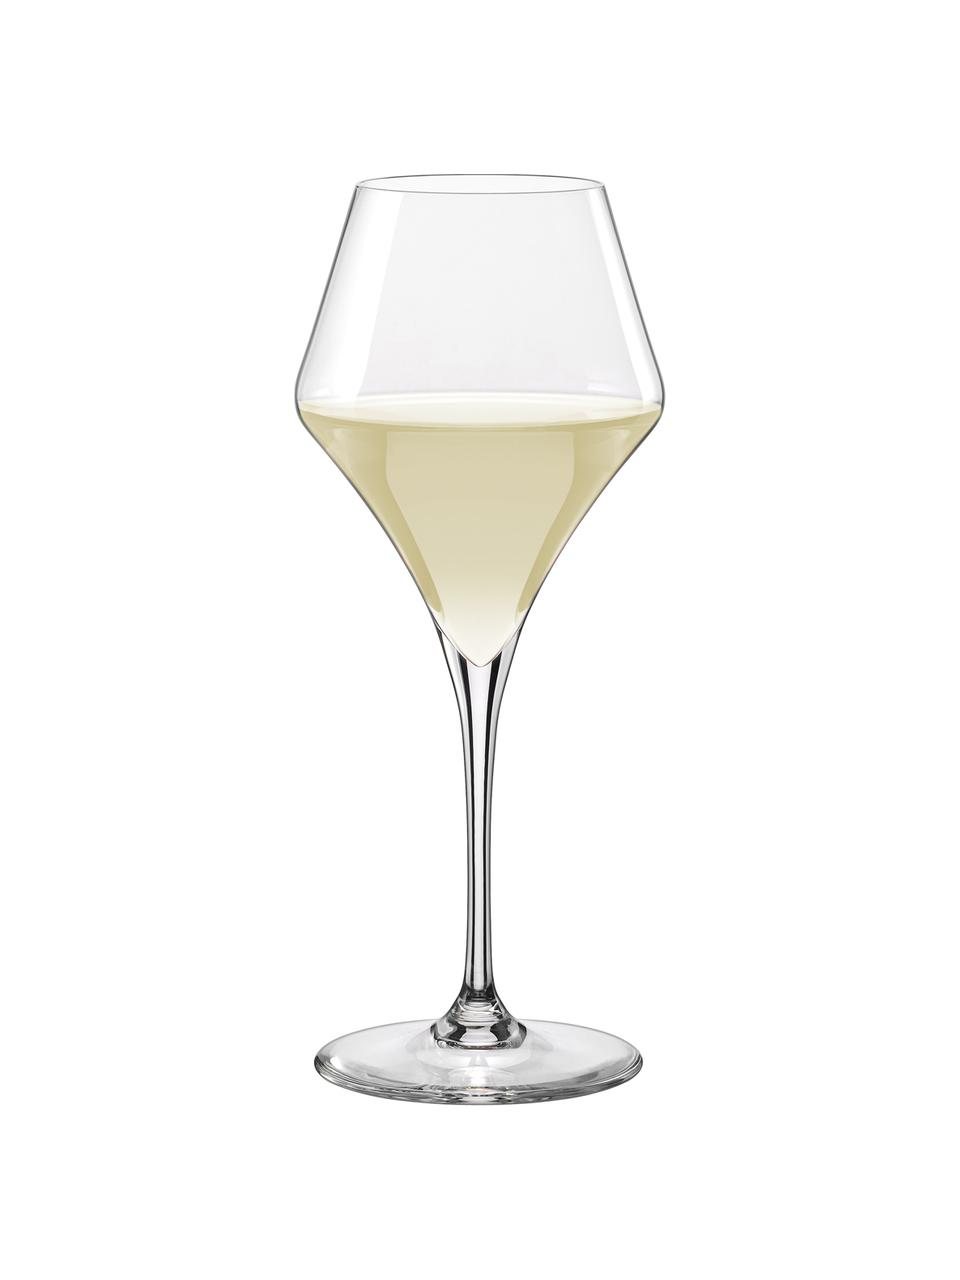 Bolvormige witte wijnglazen Aram, 6 stuks, Glas, Transparant, Ø 9 x H 22 cm